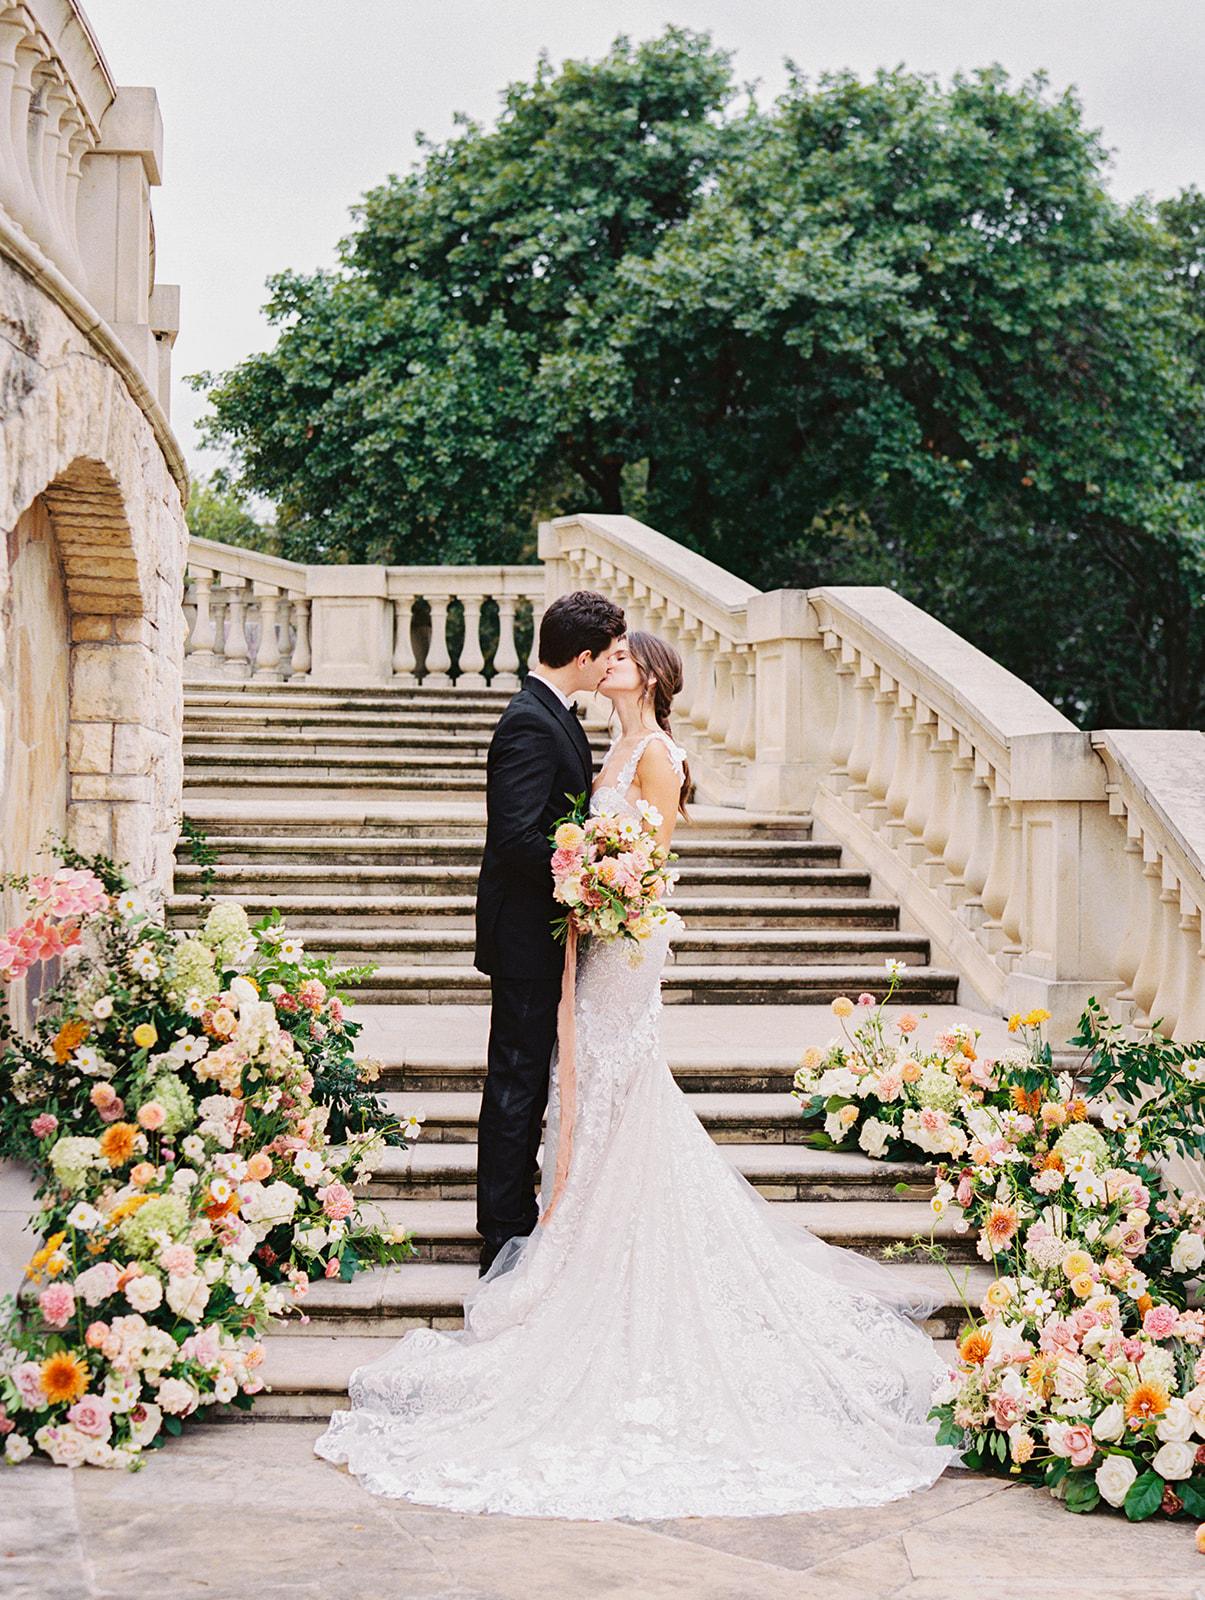 Outdoor wedding reception inspiration   Alexa Kay Events